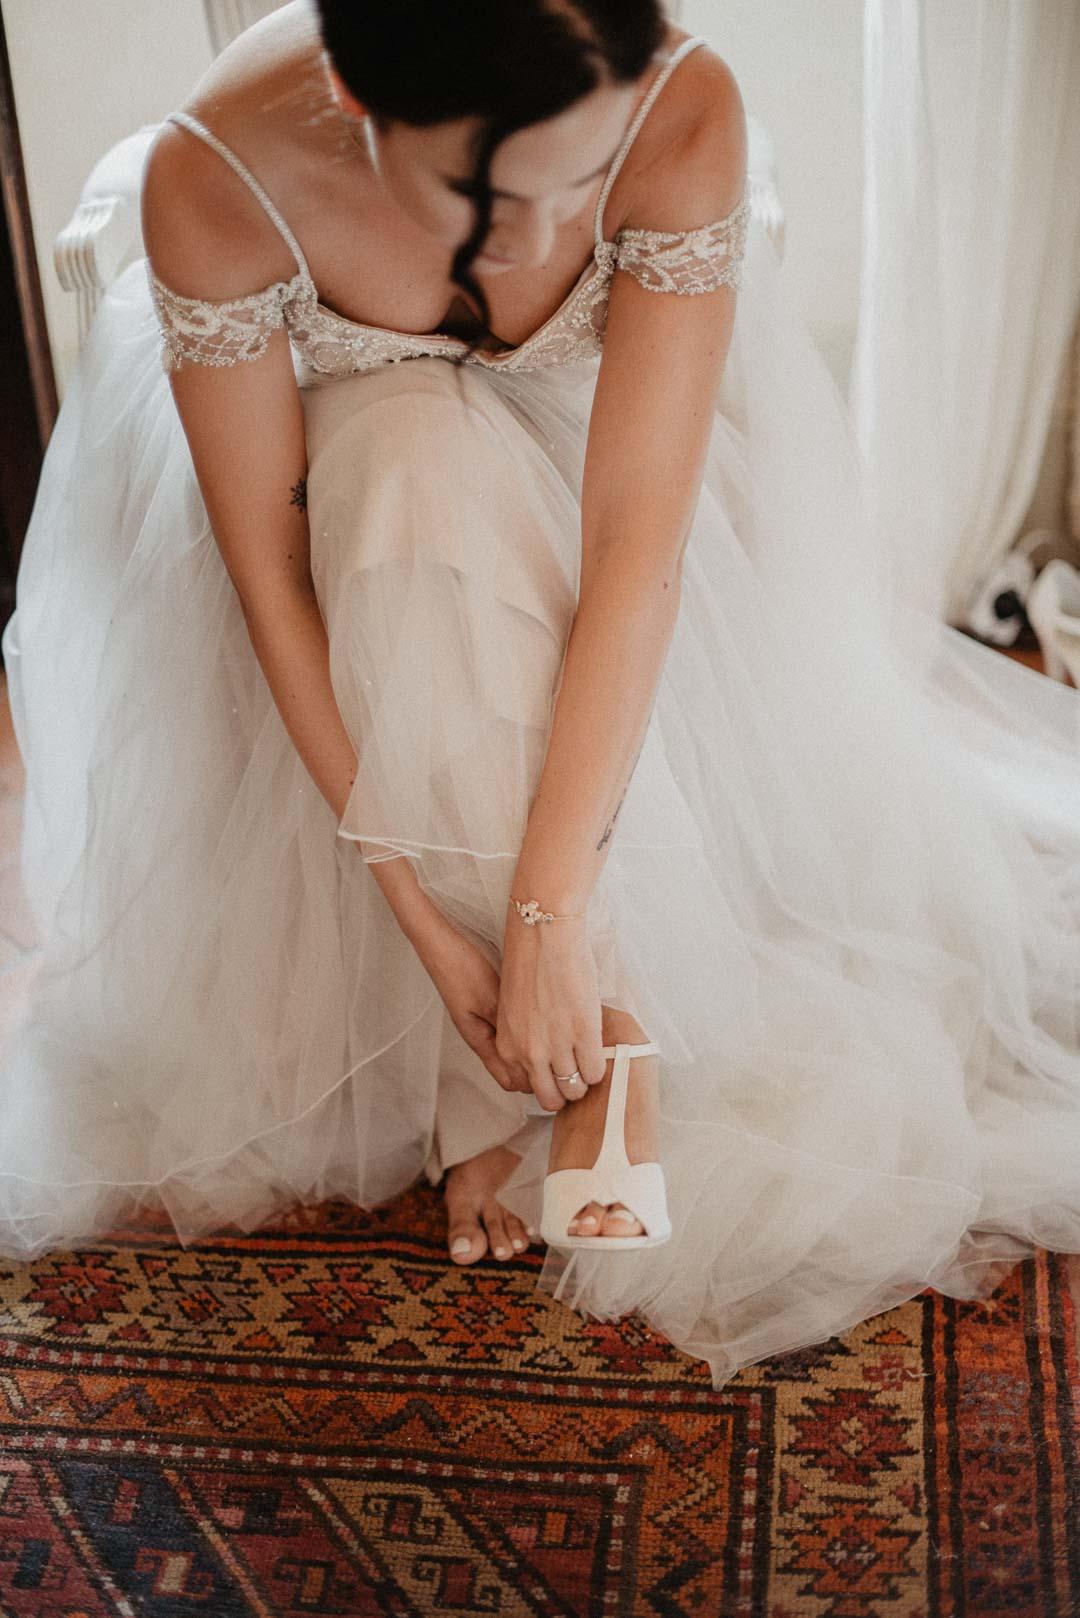 wedding-photographer-destination-fineart-bespoke-reportage-tuscany-villascorzi-vivianeizzo-spazio46-57